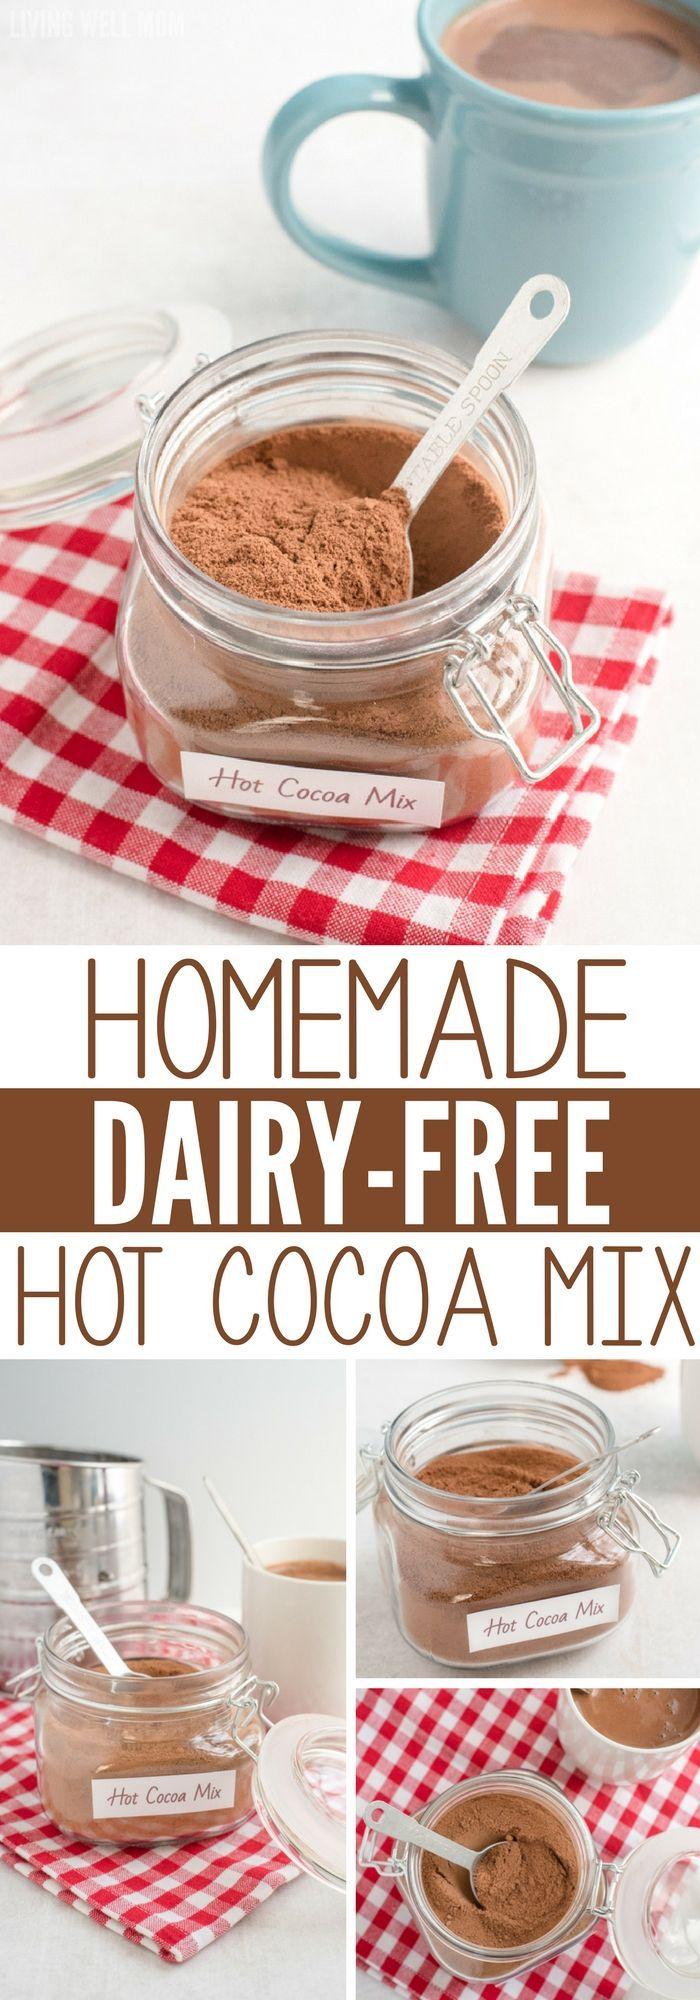 Homemade Hot Cocoa Mix Dairy Free Recipe Dairy Free Hot